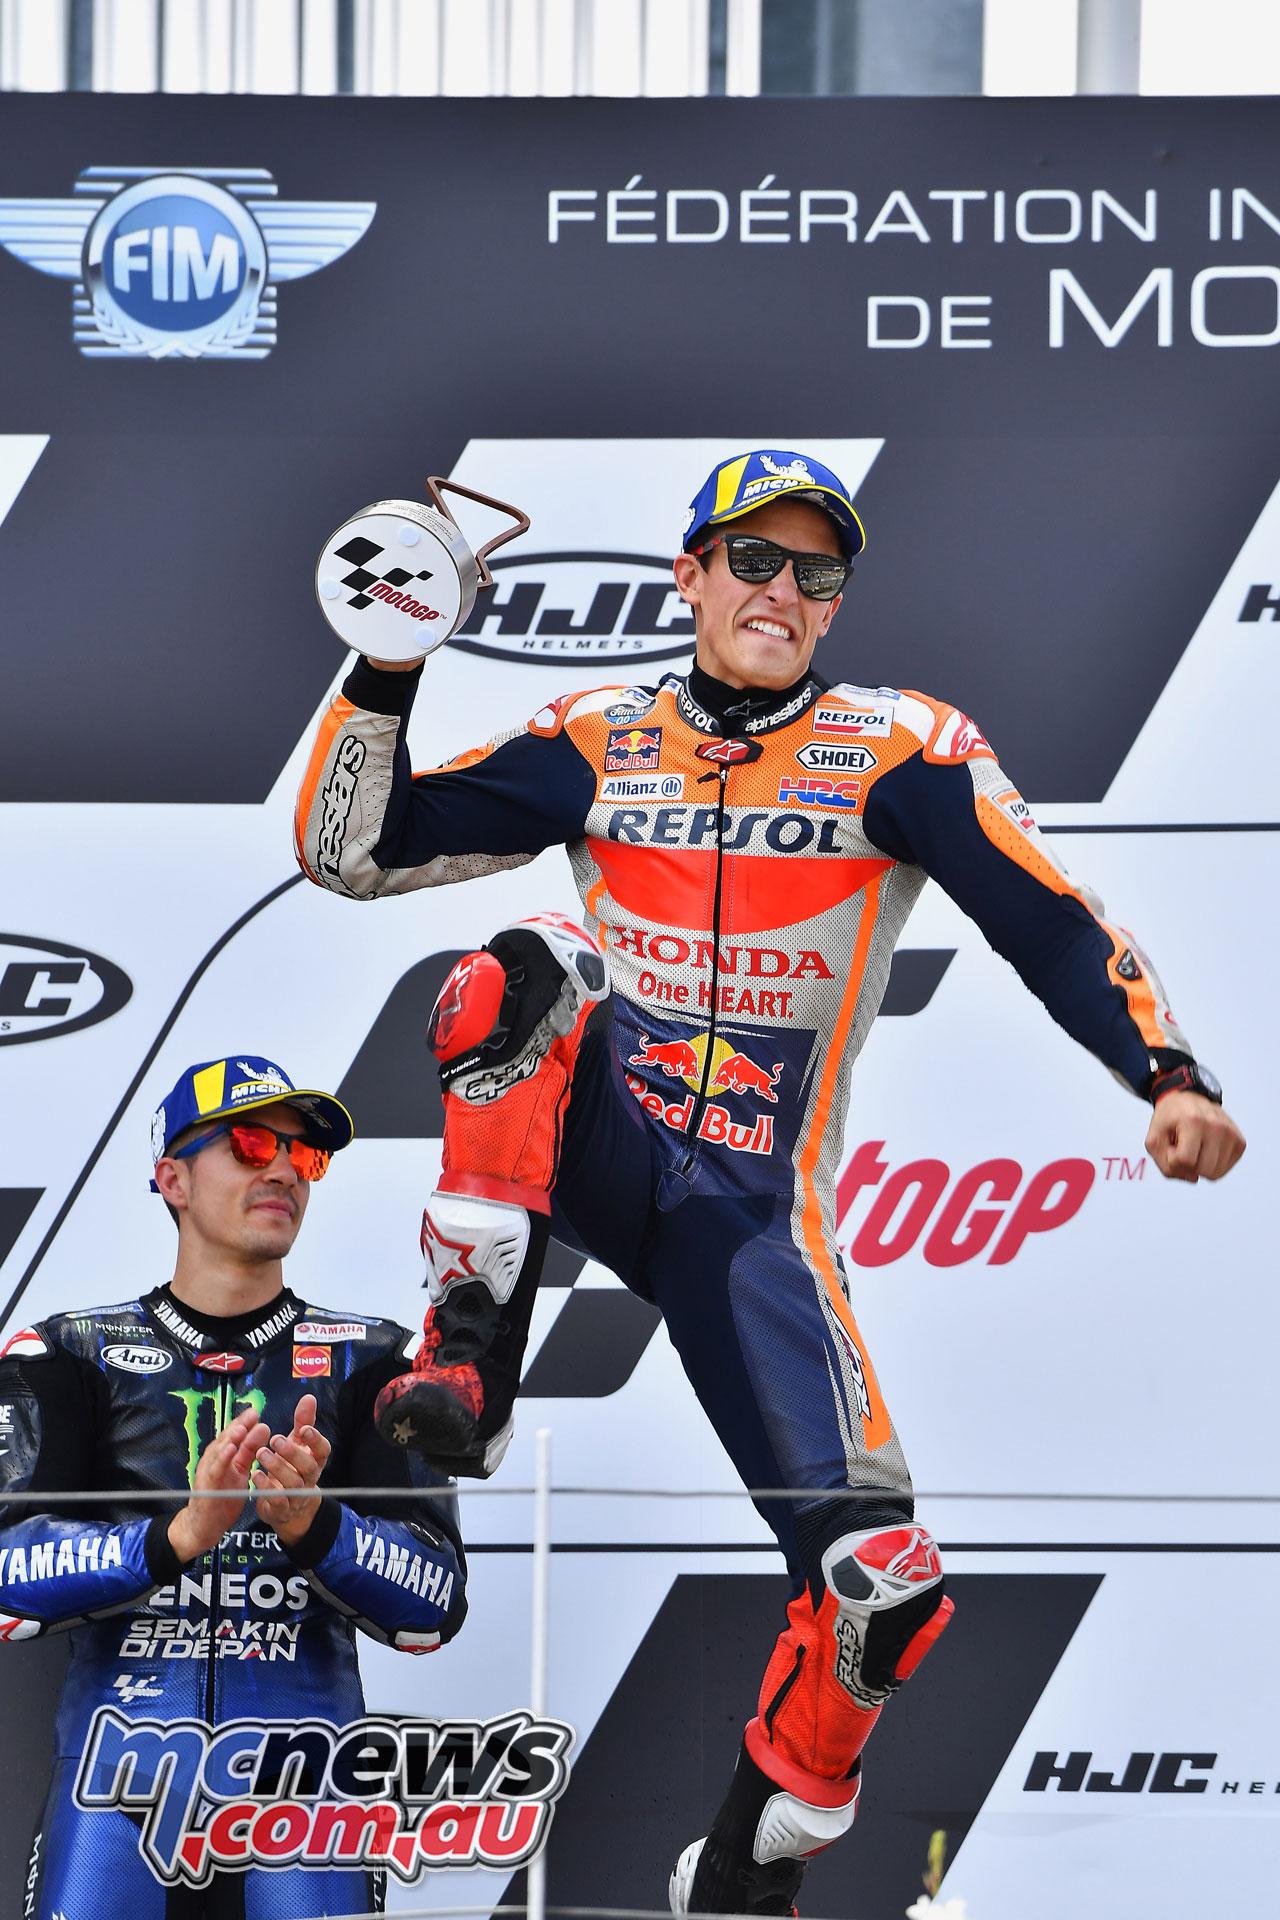 MotoGP Rnd Sachsenring Germany Marquez Podium